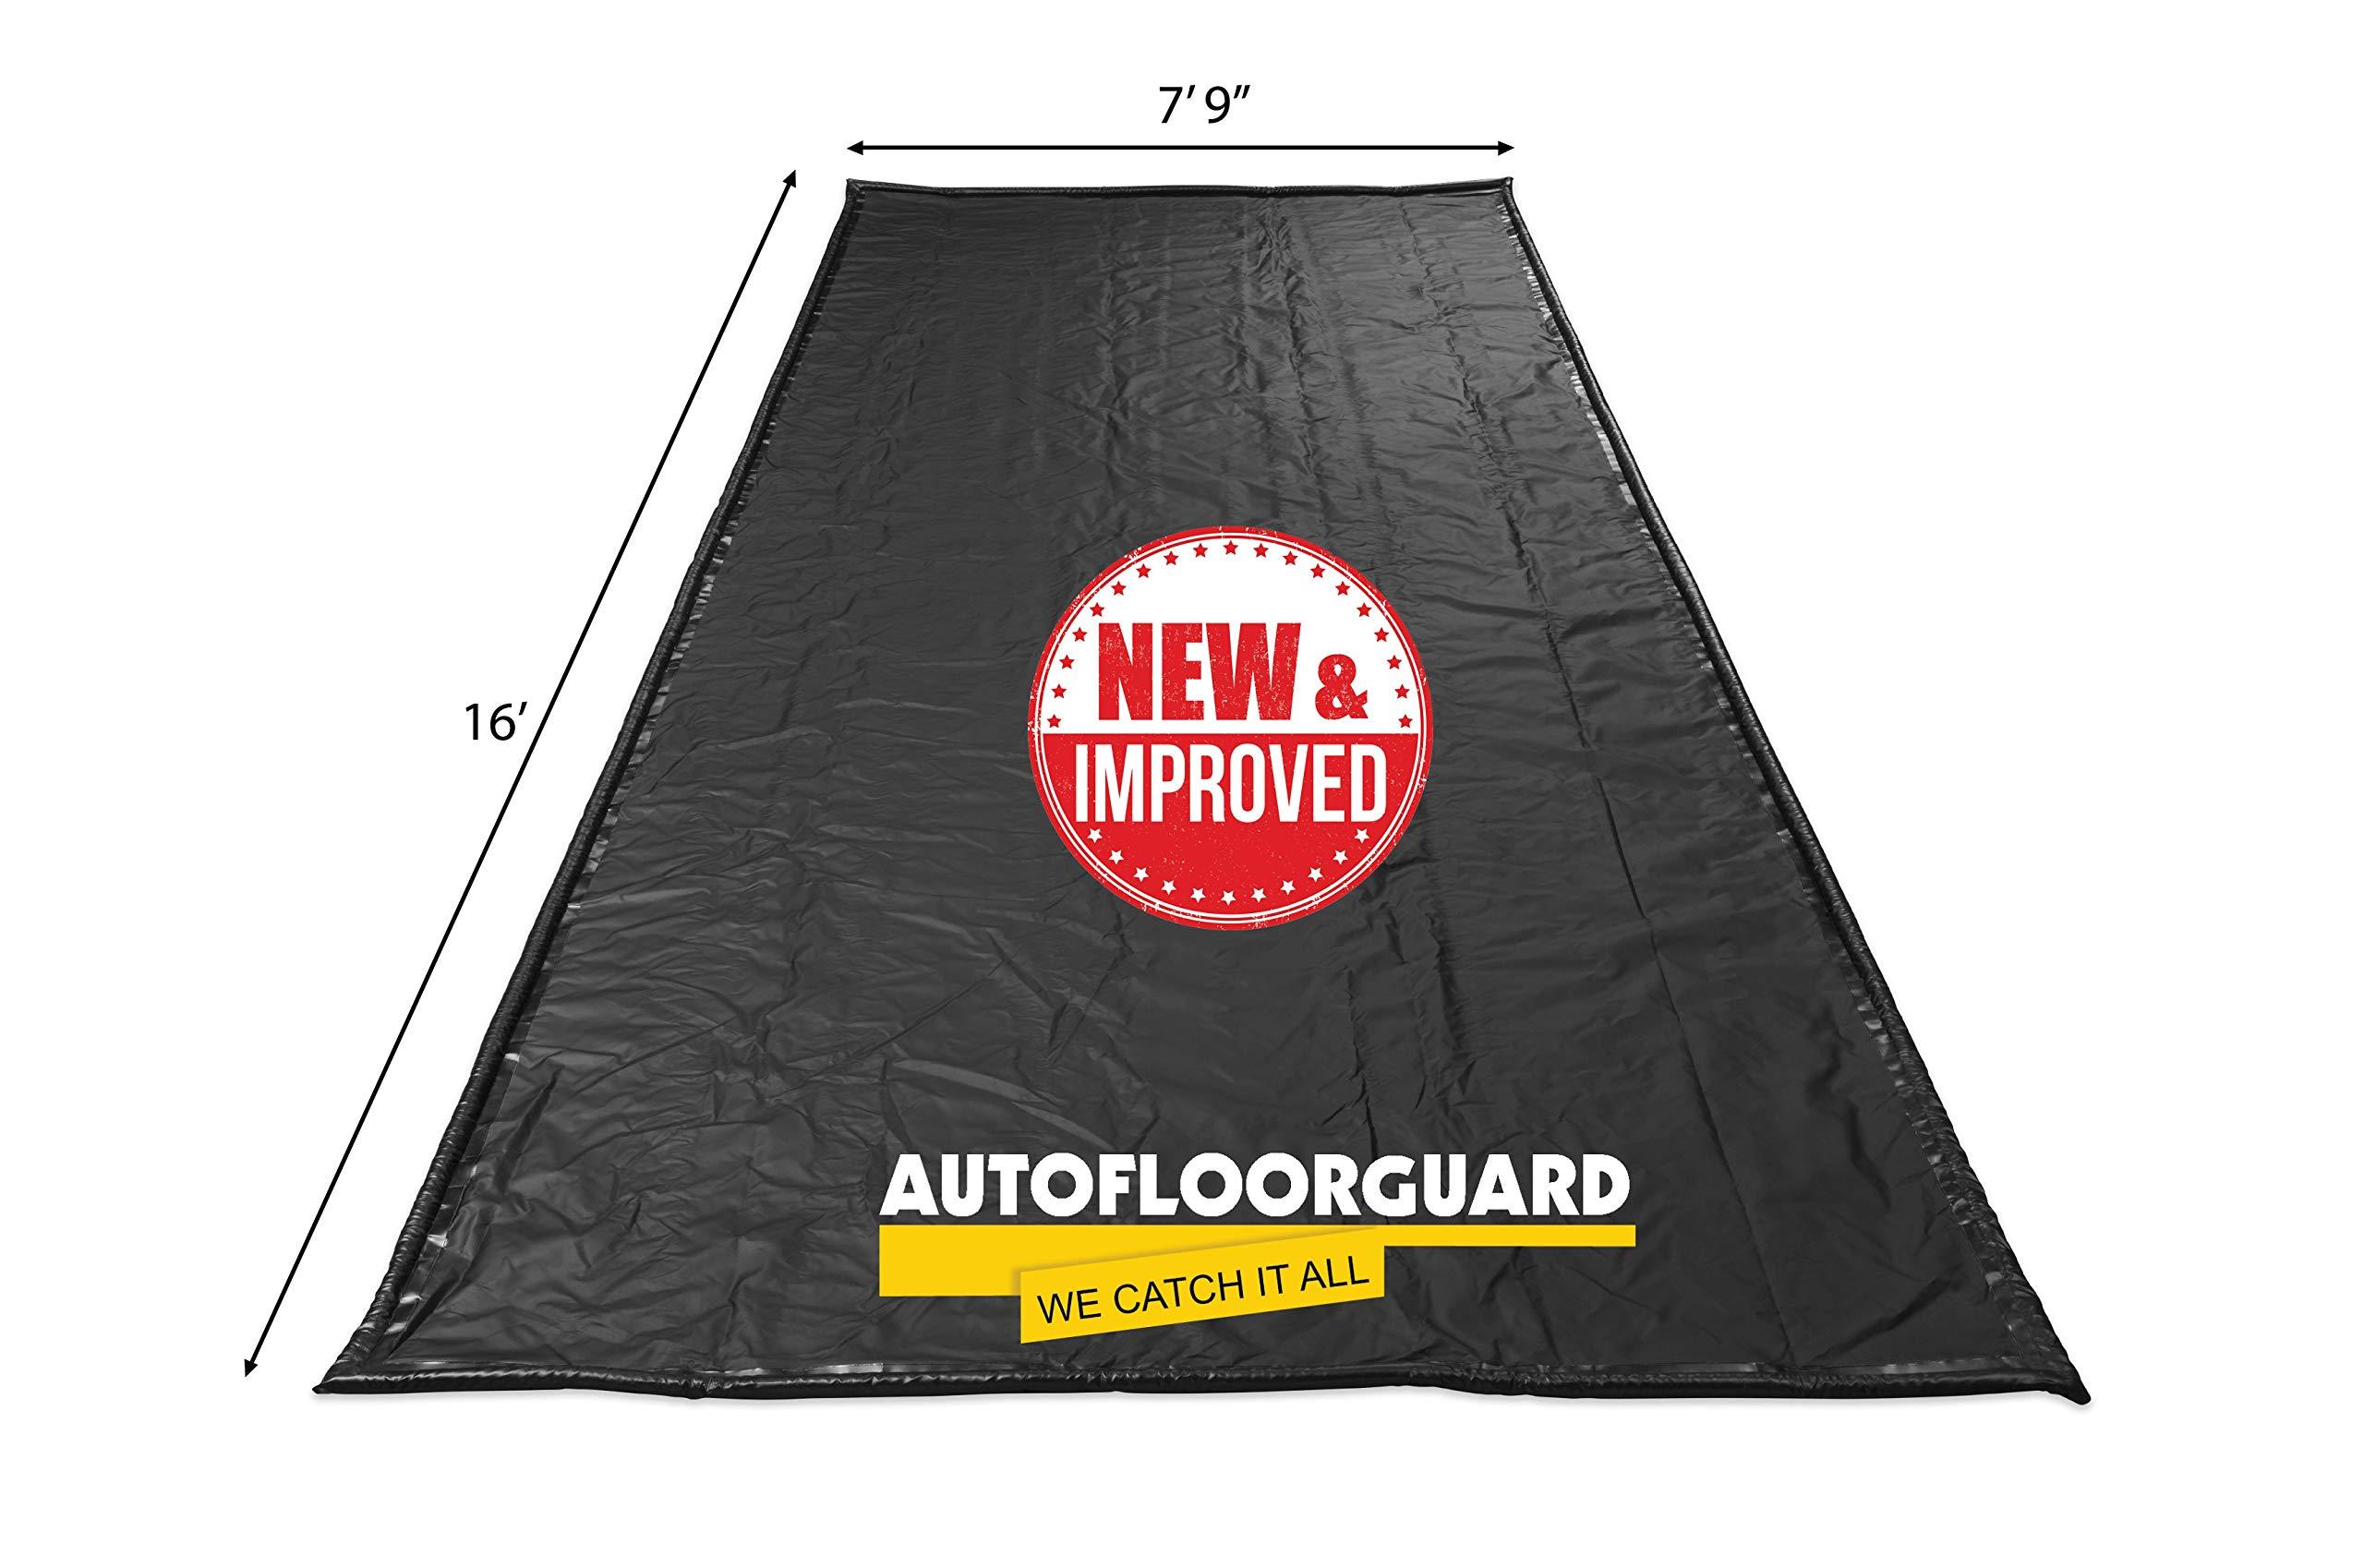 AutoFloorGuard AFGS-7916 Black 7'9'' x 16' AFG Compact Size Containment mat by AutoFloorGuard (Image #2)